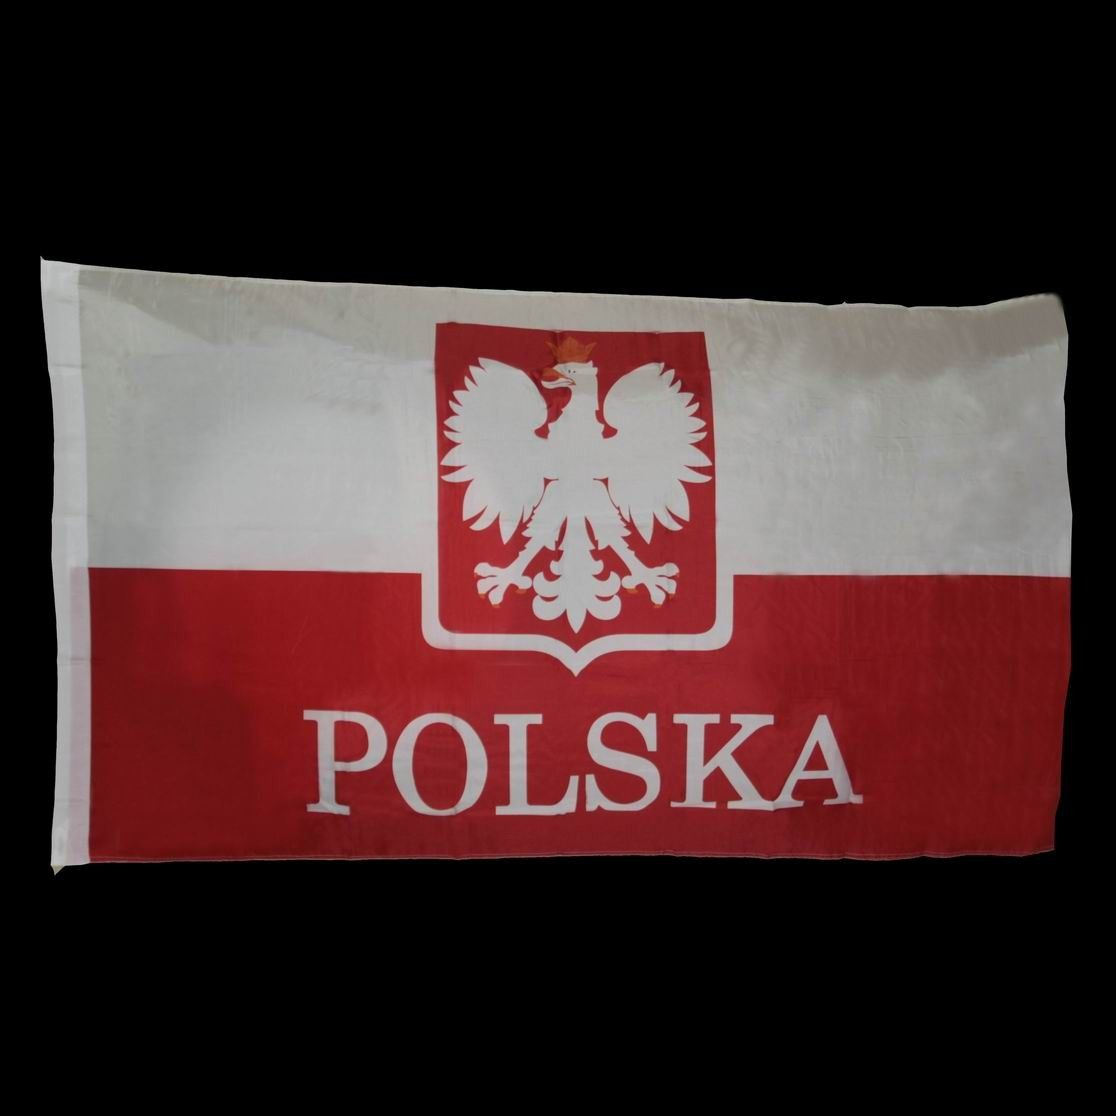 Me meaning of polish flag - Flag Of Poland